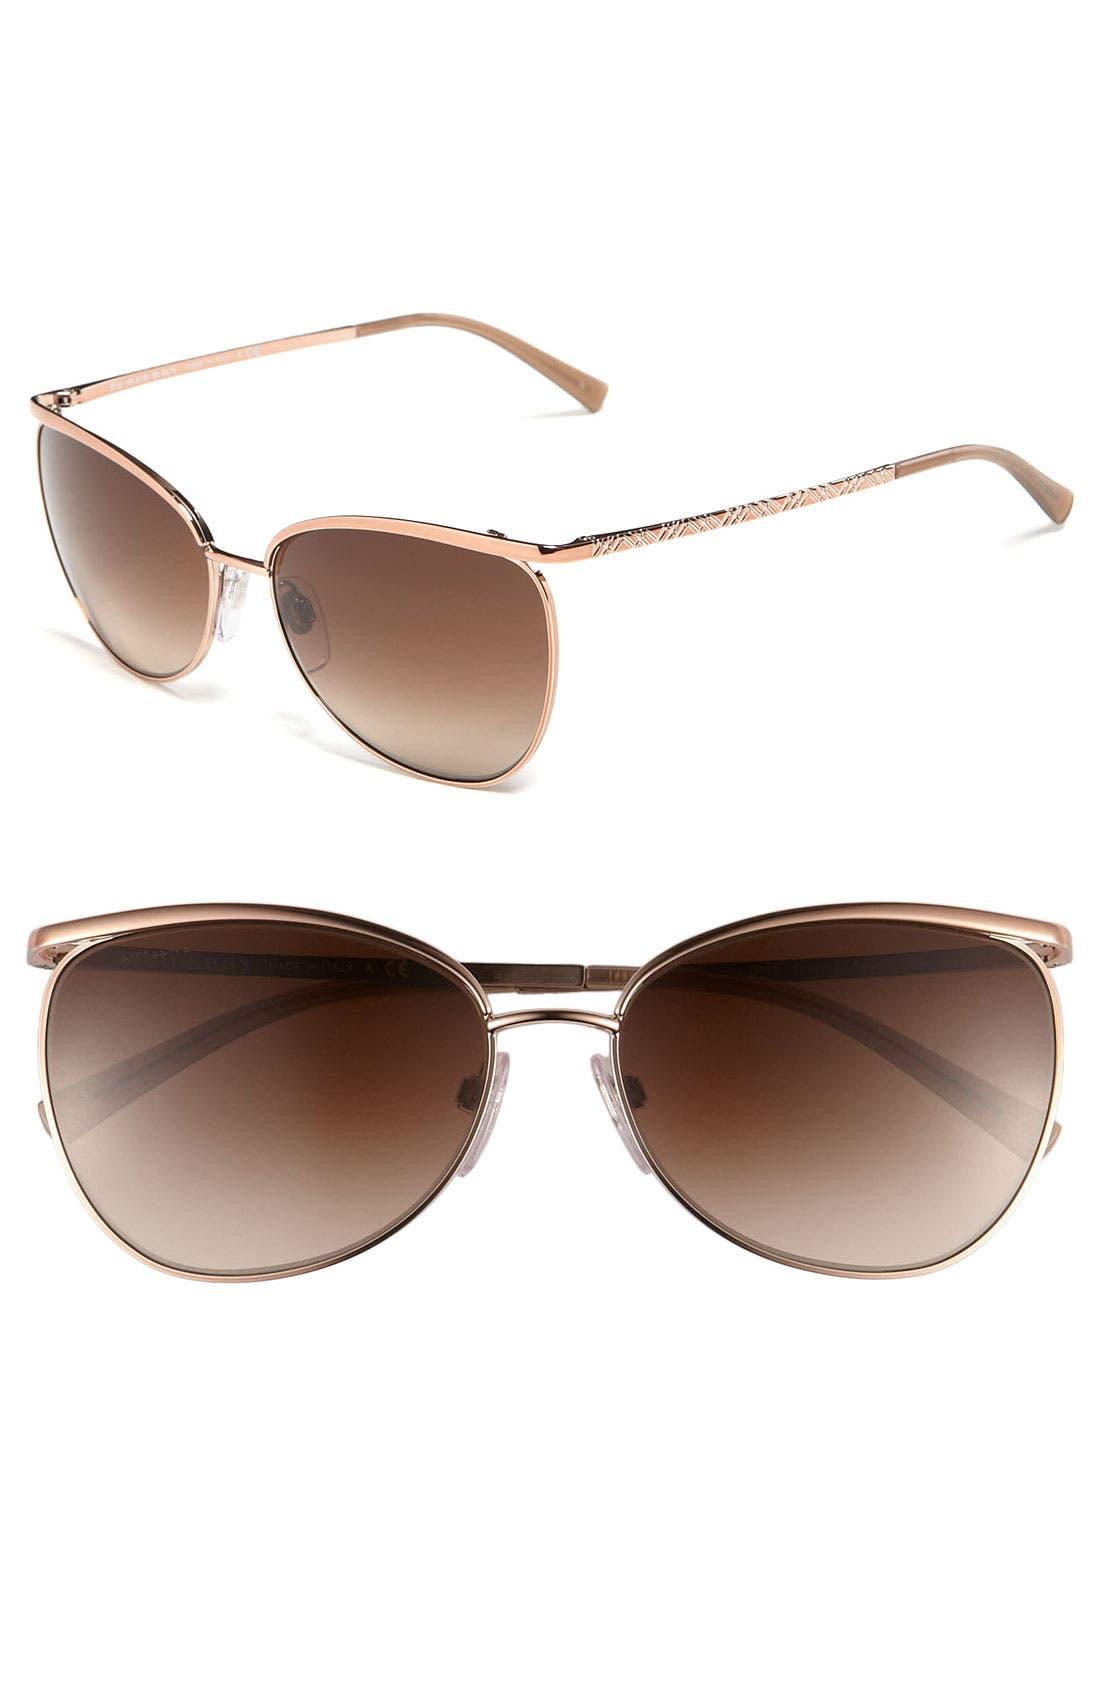 Alternate Image 1 Selected - Burberry 58mm Metal Cat's Eye Sunglasses